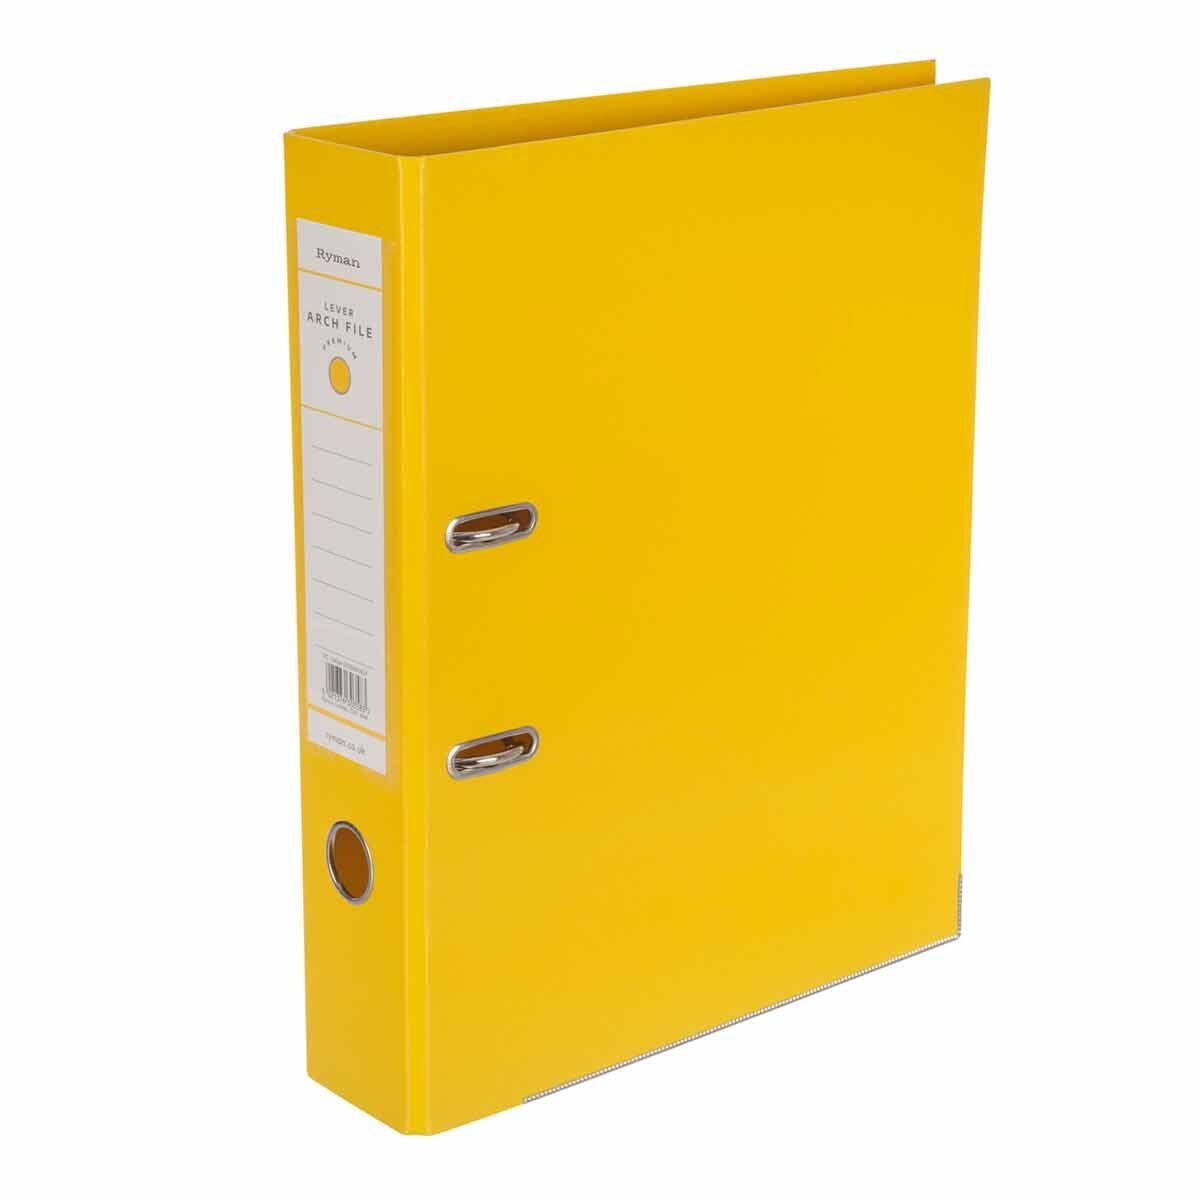 Ryman Premium Lever Arch File Foolscap Yellow